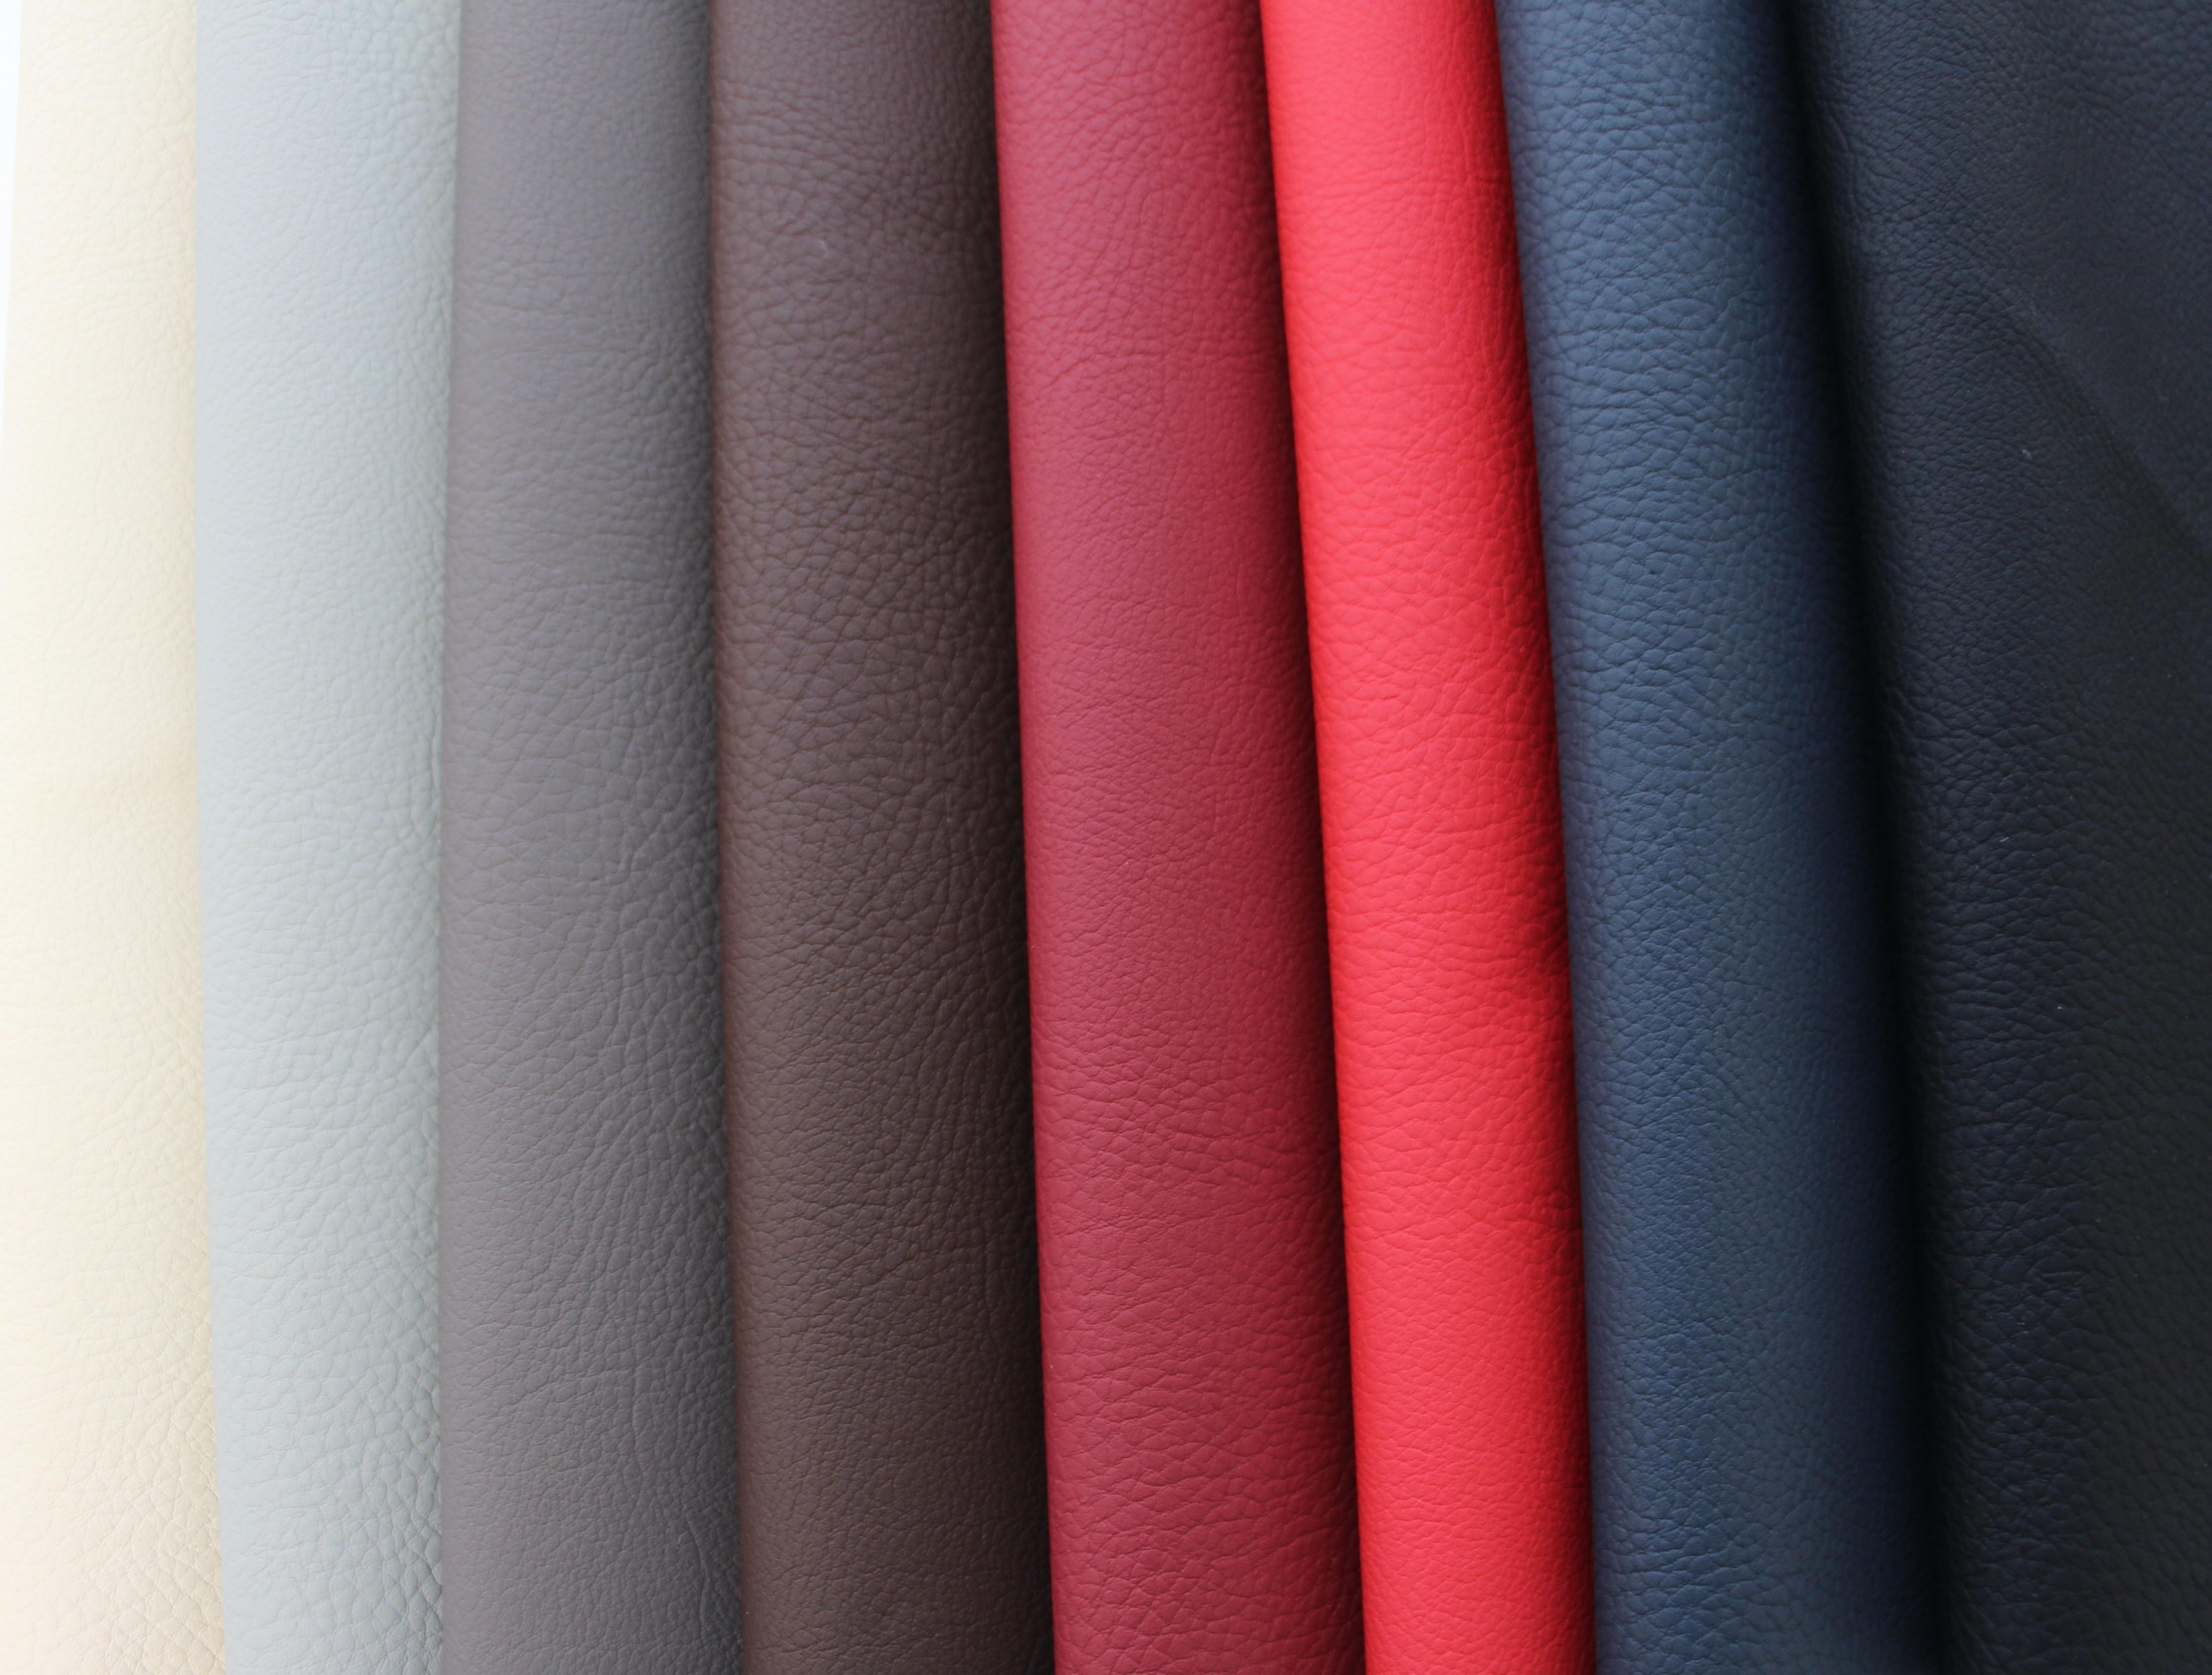 échantillon coloris PVC CRUSH fauteui-relax-médilax-600